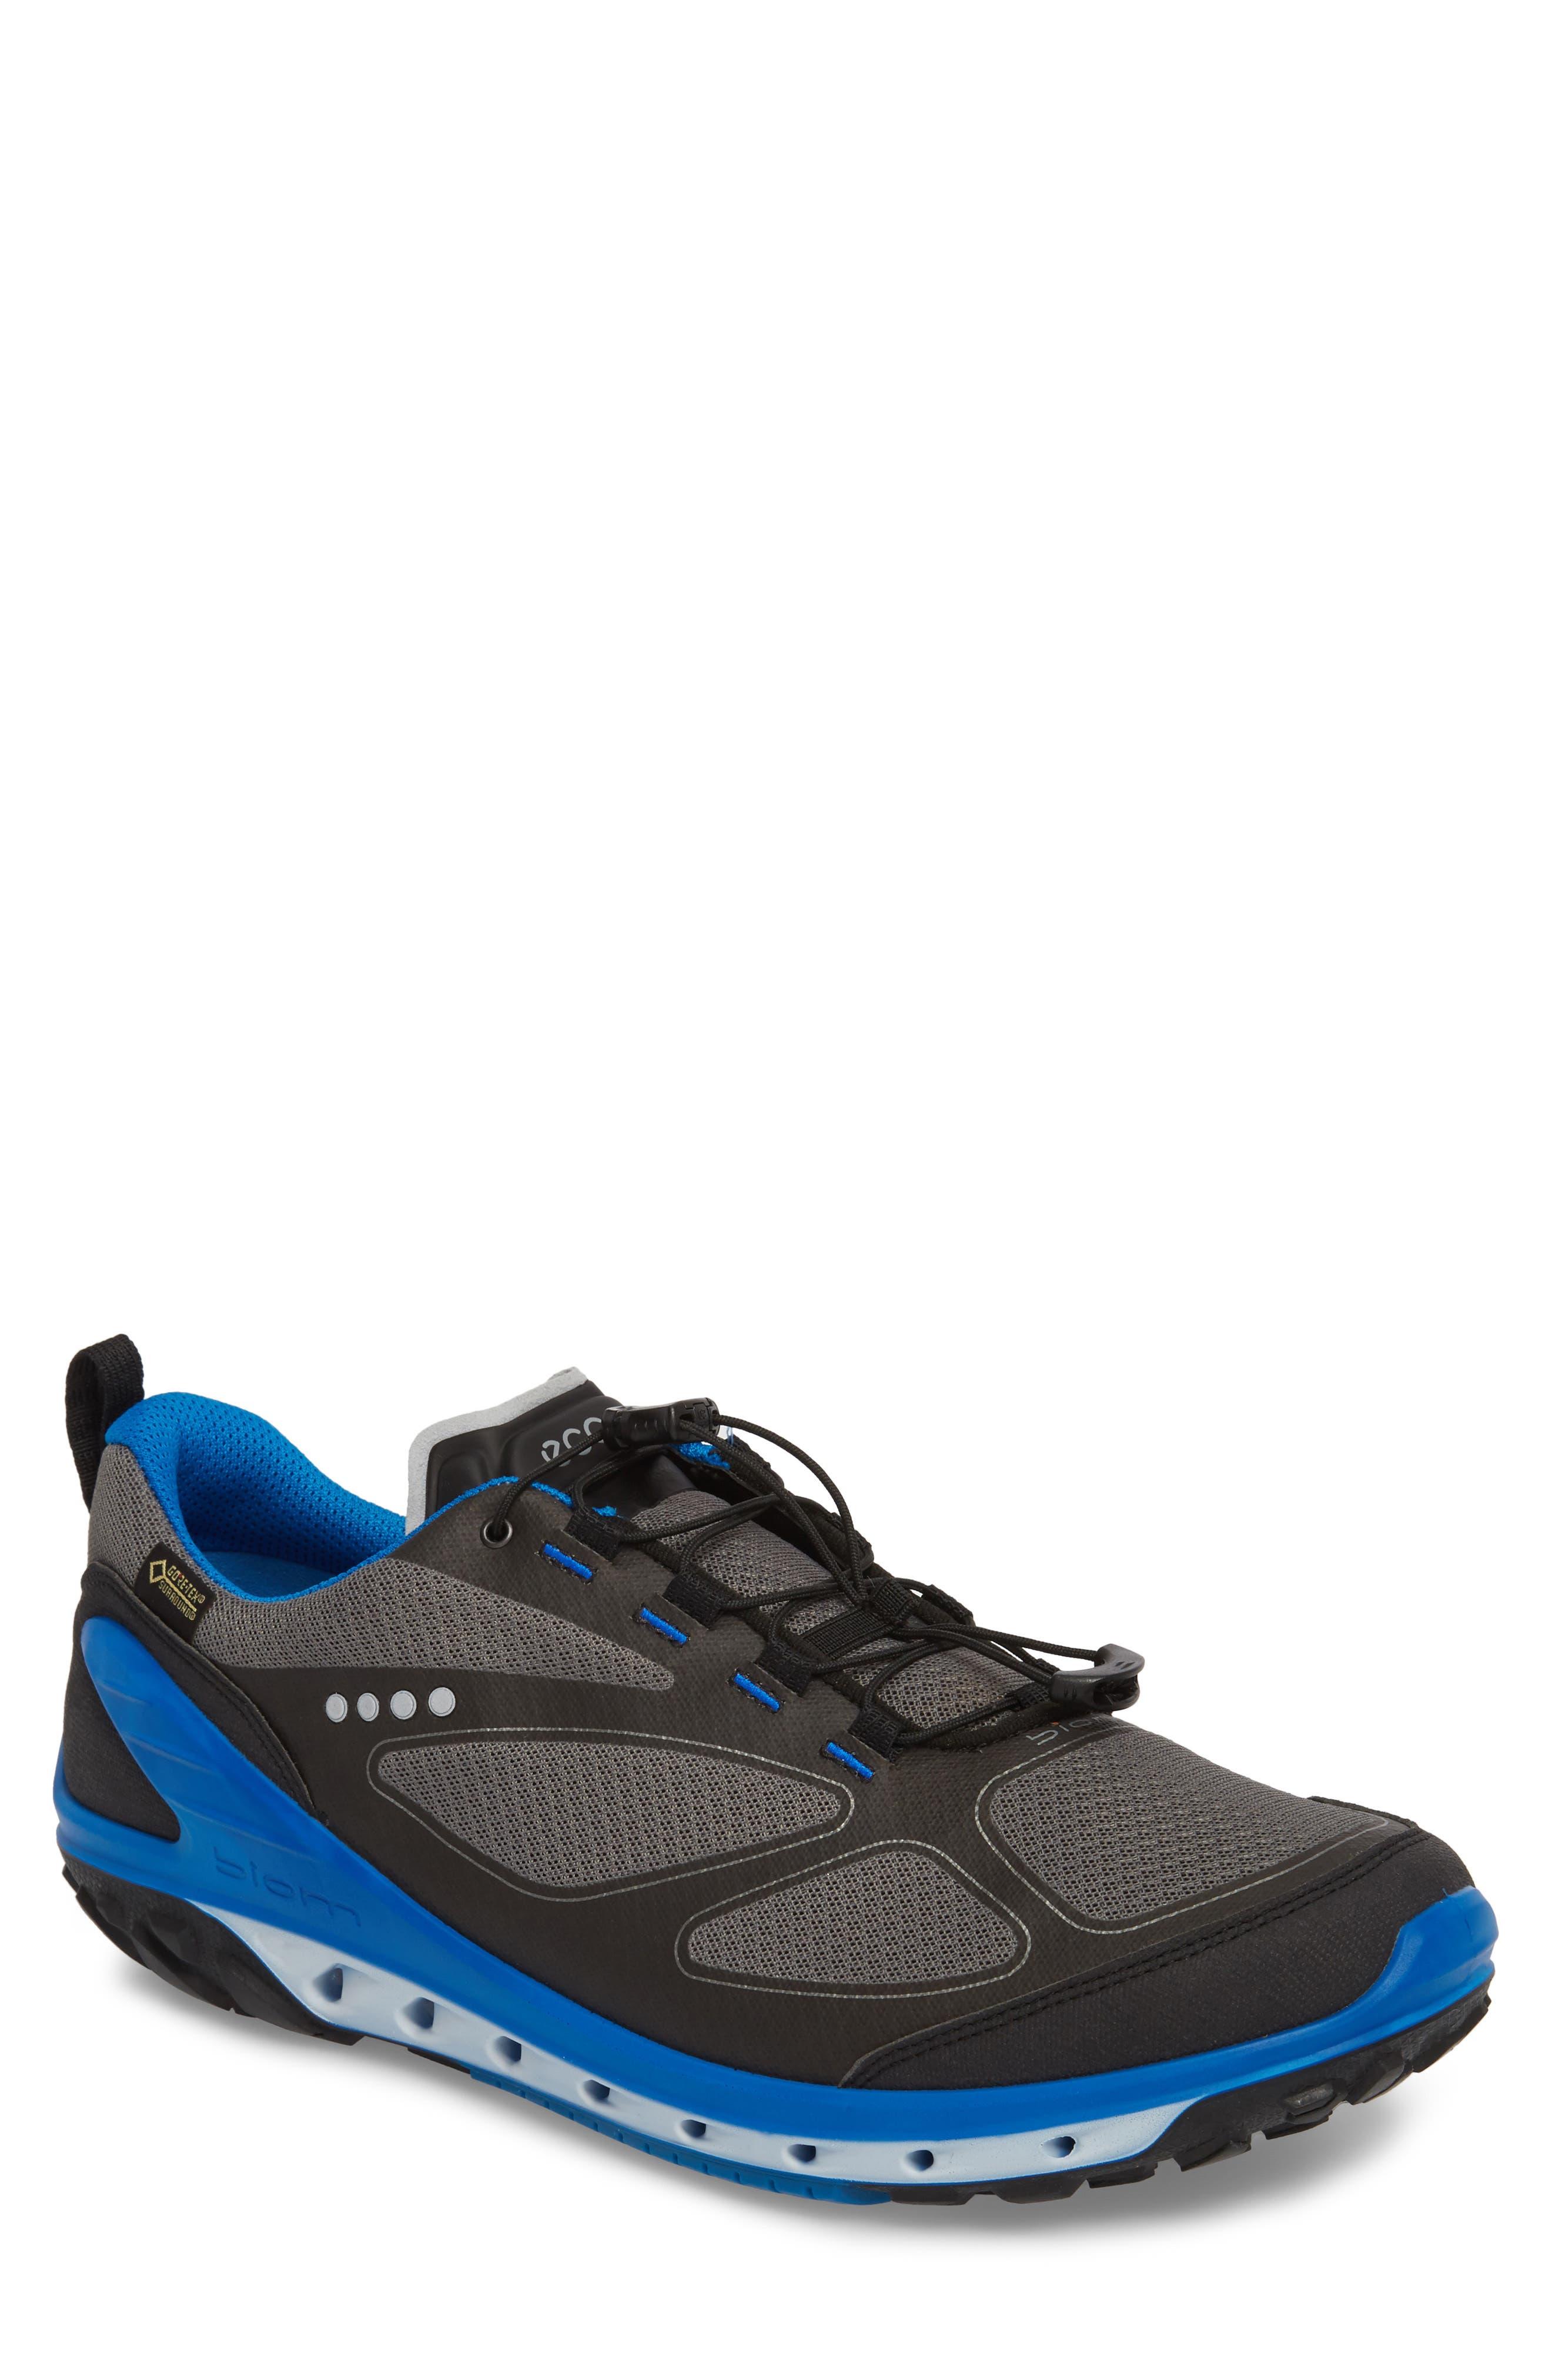 BIOM Venture GTX Sneaker,                             Main thumbnail 1, color,                             Black/ Titanium Leather